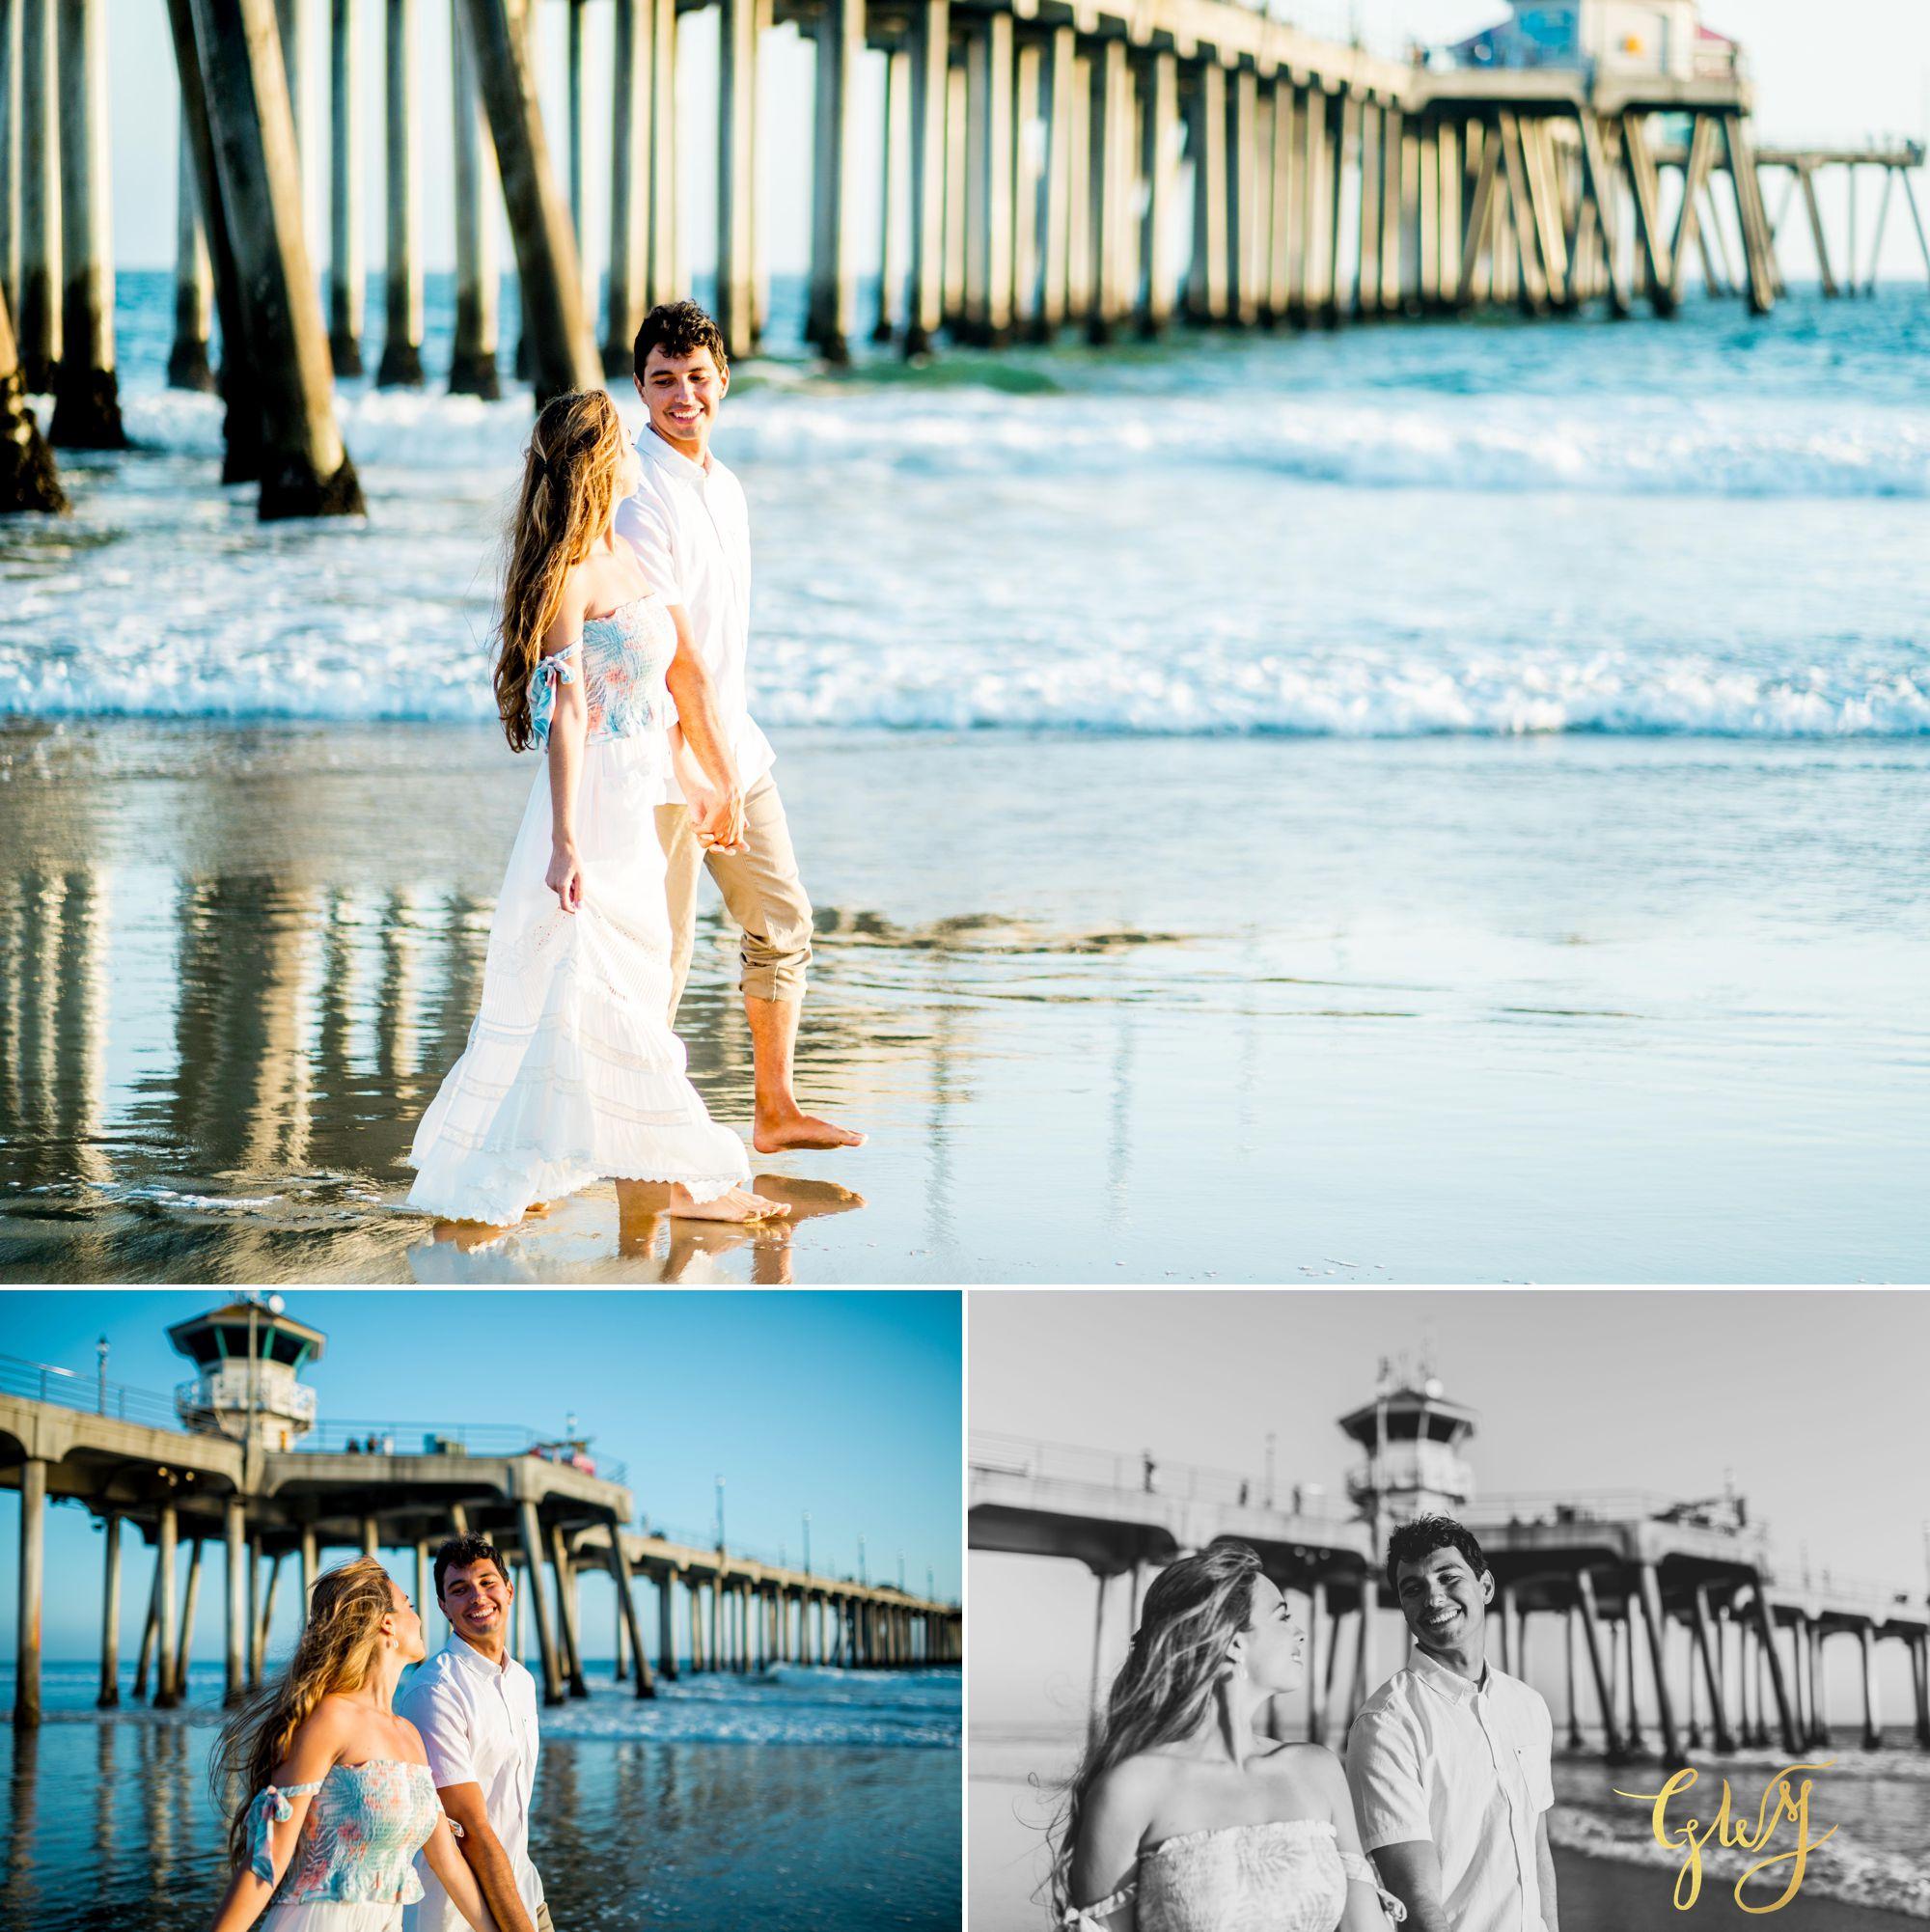 Felipe + Isabella Huntington Beach Summer Sunset Engagement Session by Glass Woods Media 21.jpg